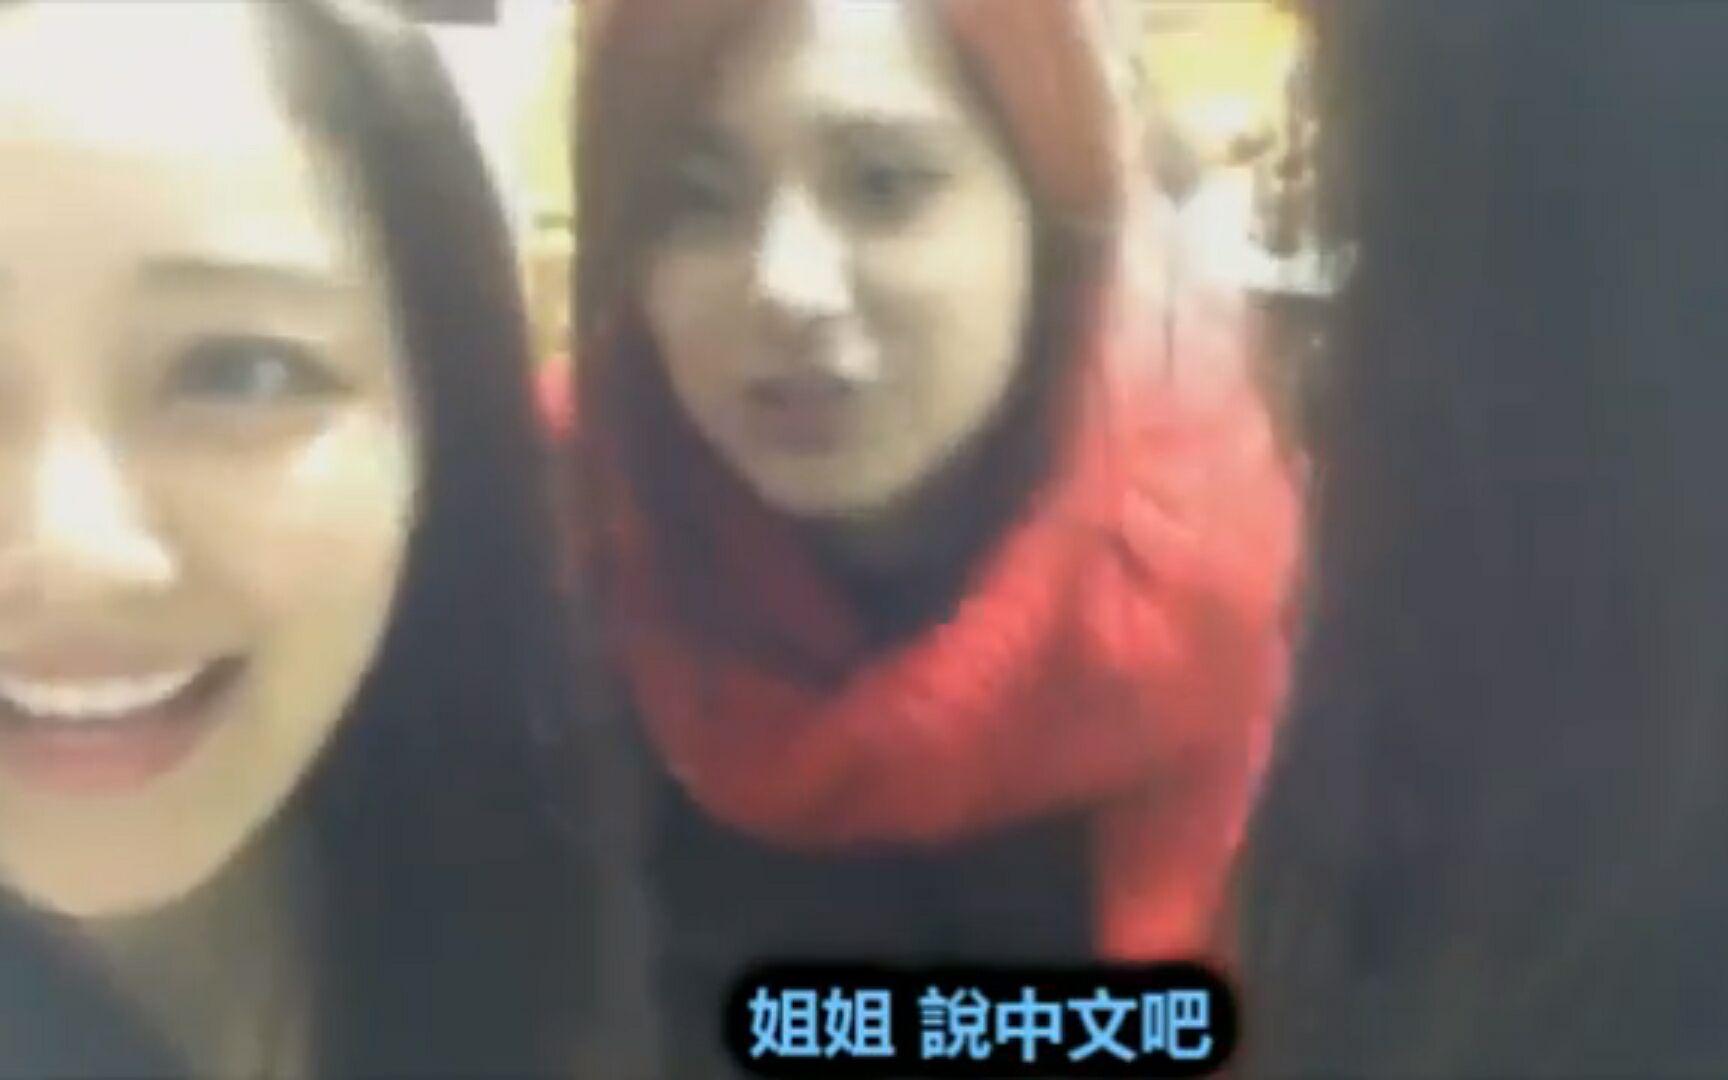 『twice』子瑜傻眼 日語的新年快樂也太長了吧.....(表情包)_Korea相關_娛樂_bilibili_嗶哩嗶哩